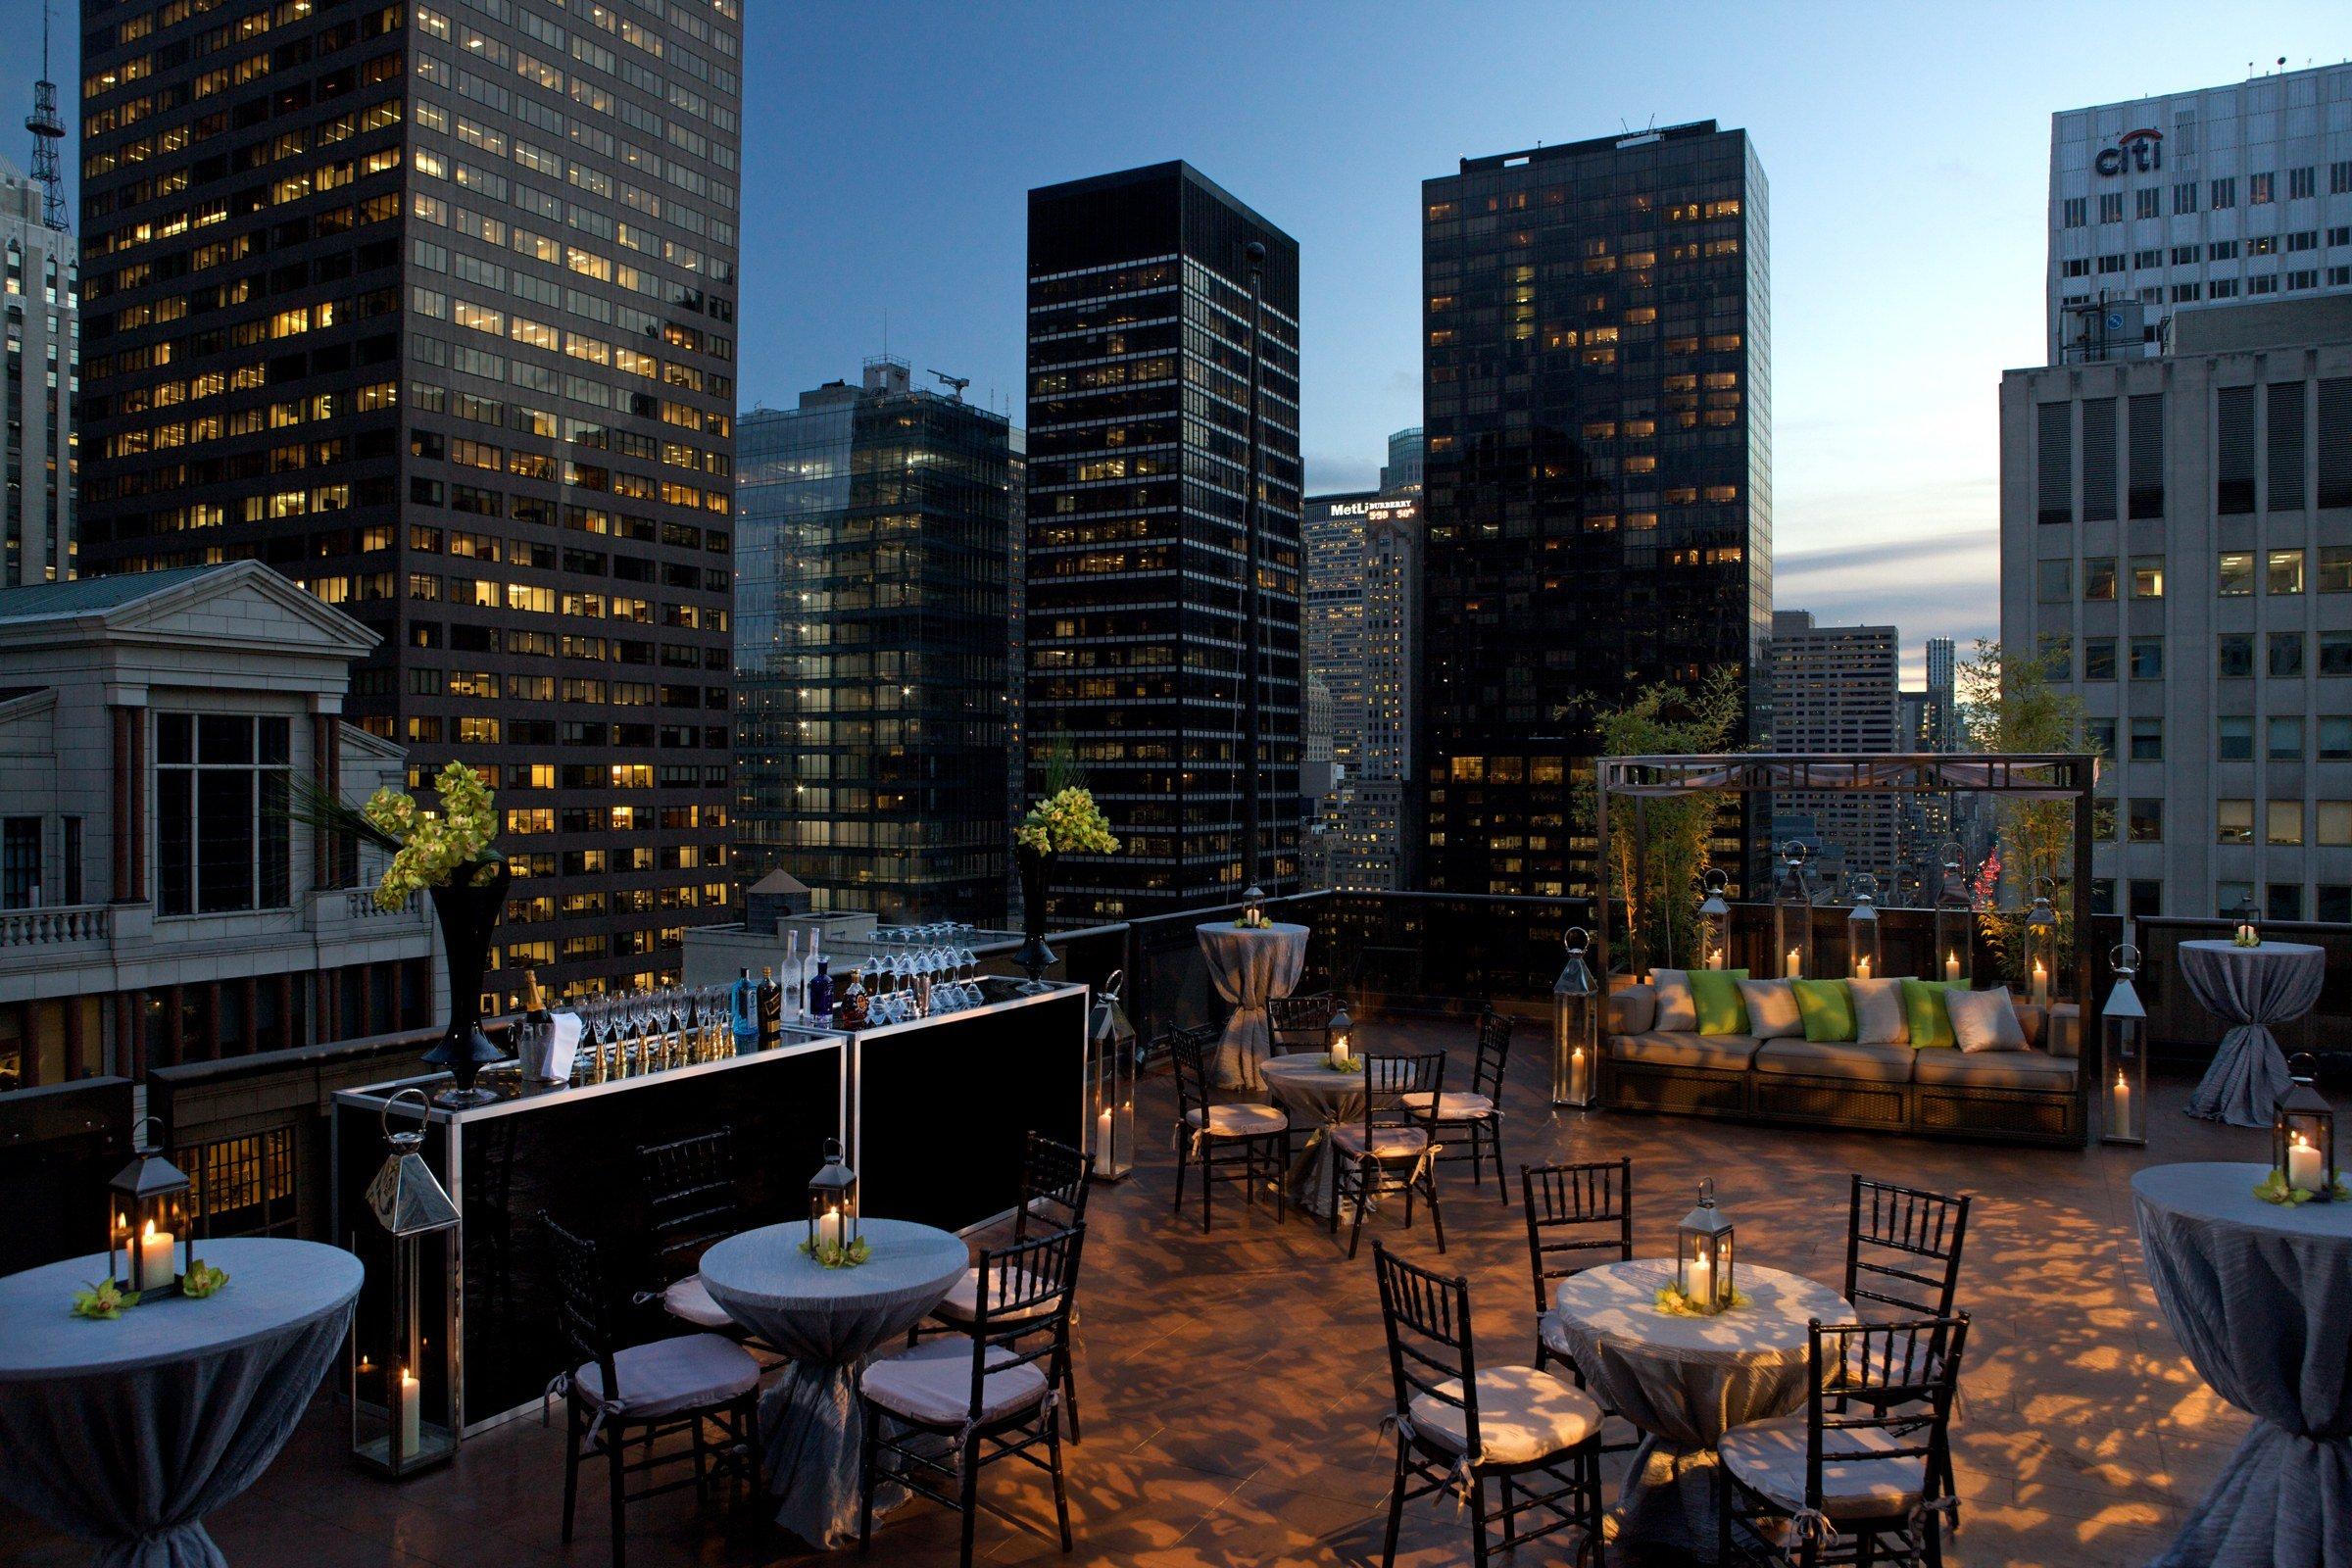 New York 11 Toits Terrasses Rooftops A Visiter Au Moins Une Fois